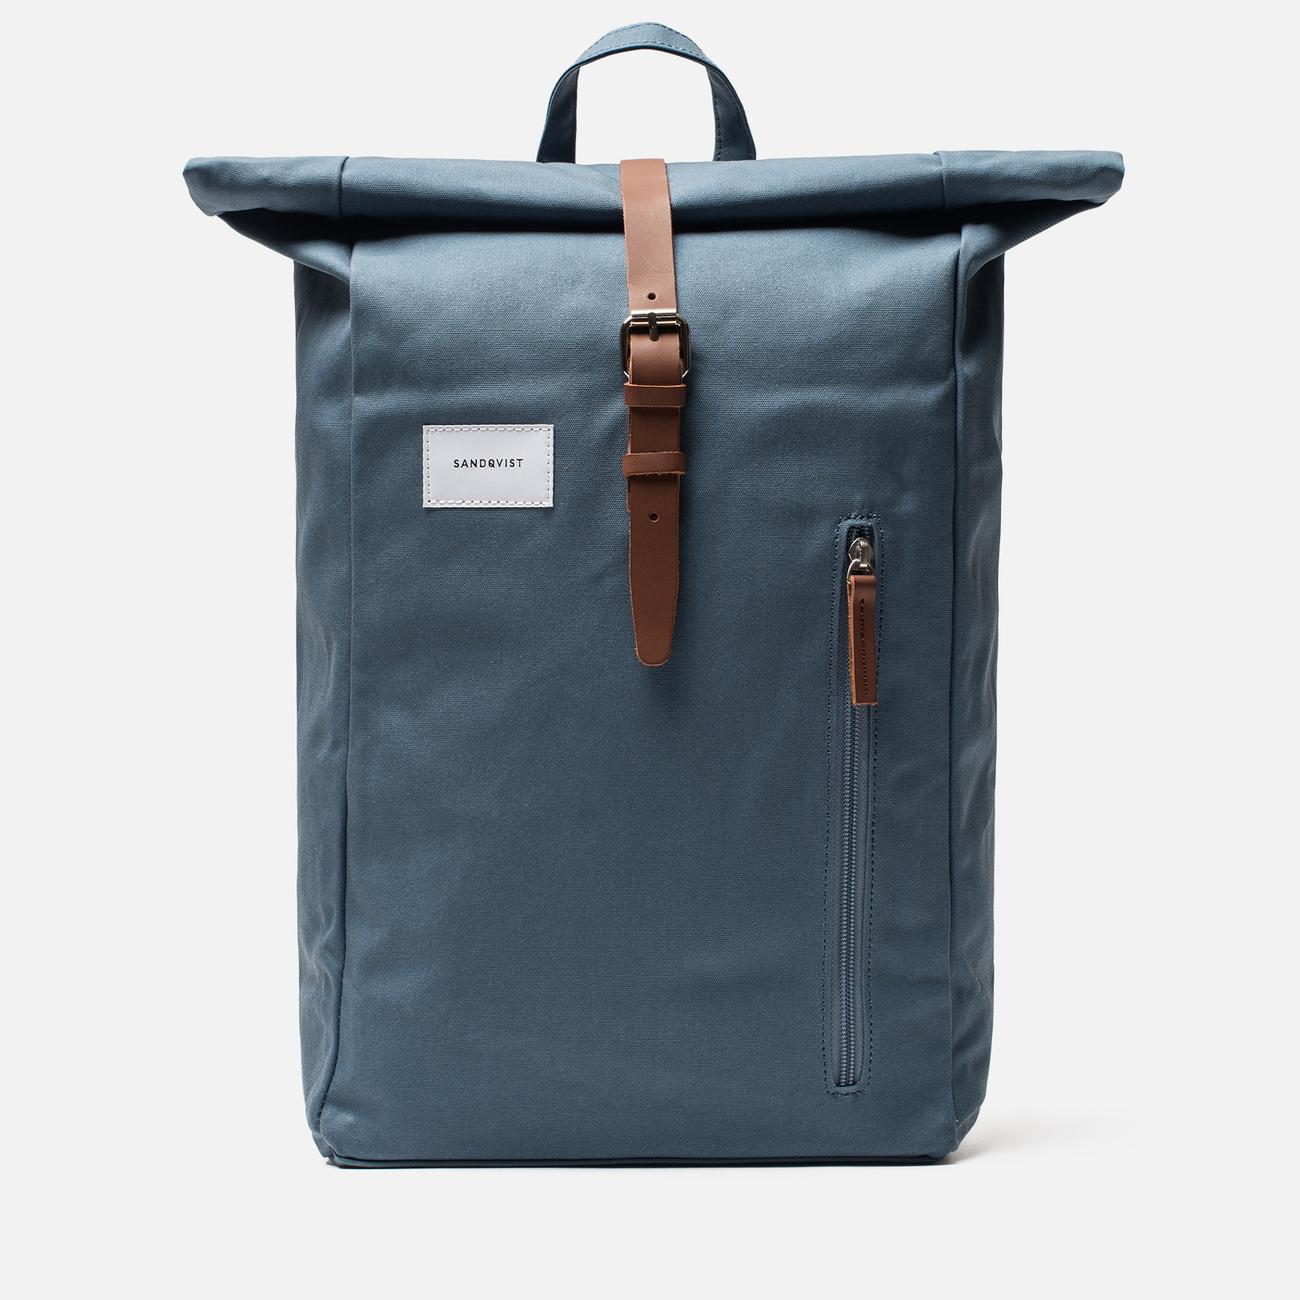 Рюкзак Sandqvist Dante Dusty Blue/Cognac Brown Leather